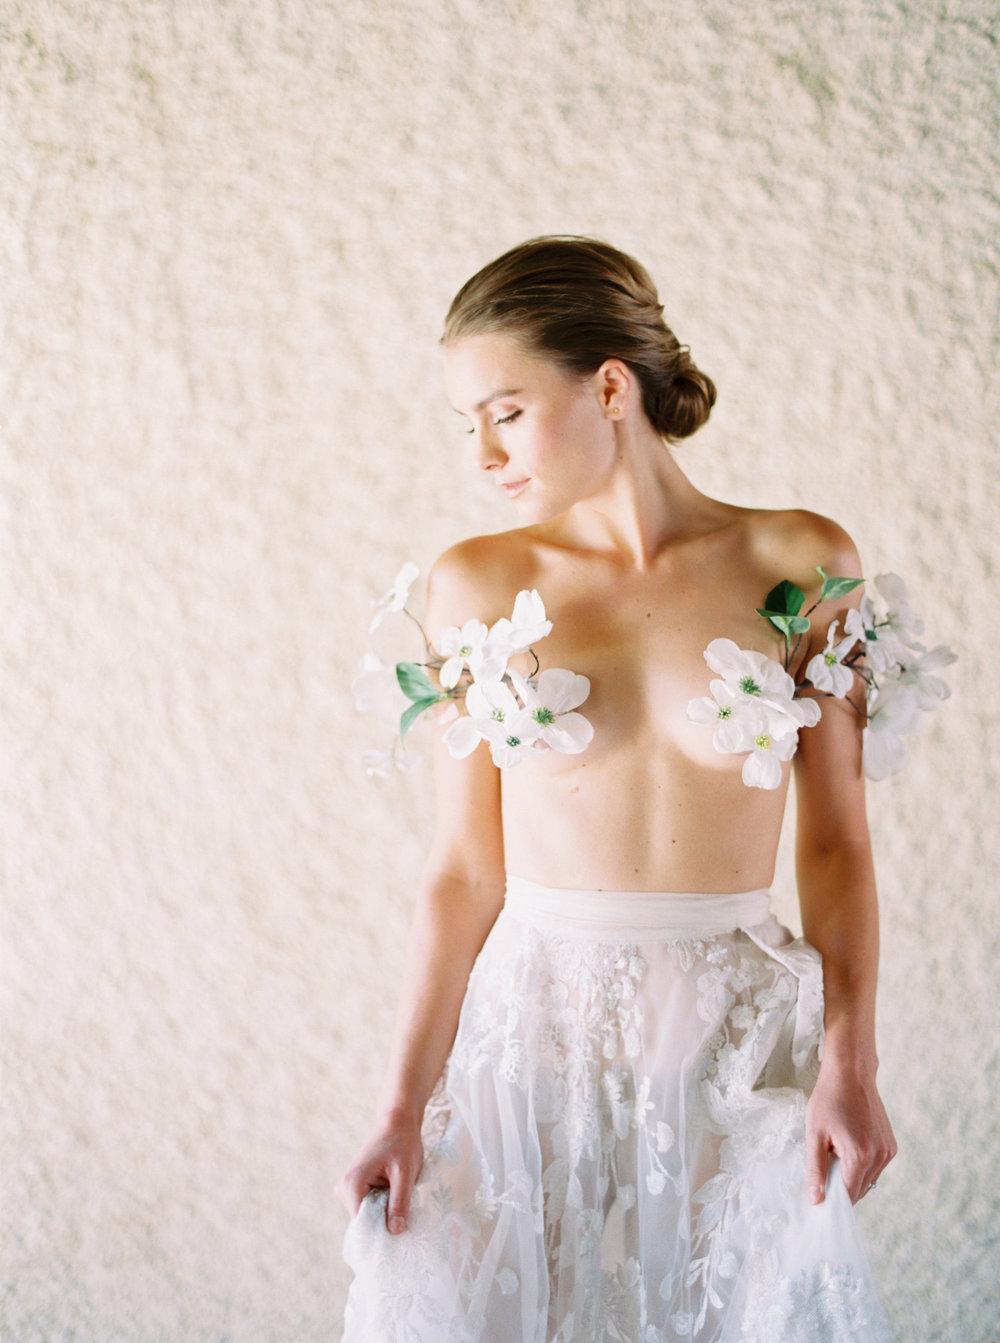 JennyQuicksallPhotography_www.jennyquicksall.com_KestlerPark_SantaYnezCalifornia_JoyProctor(44).jpg